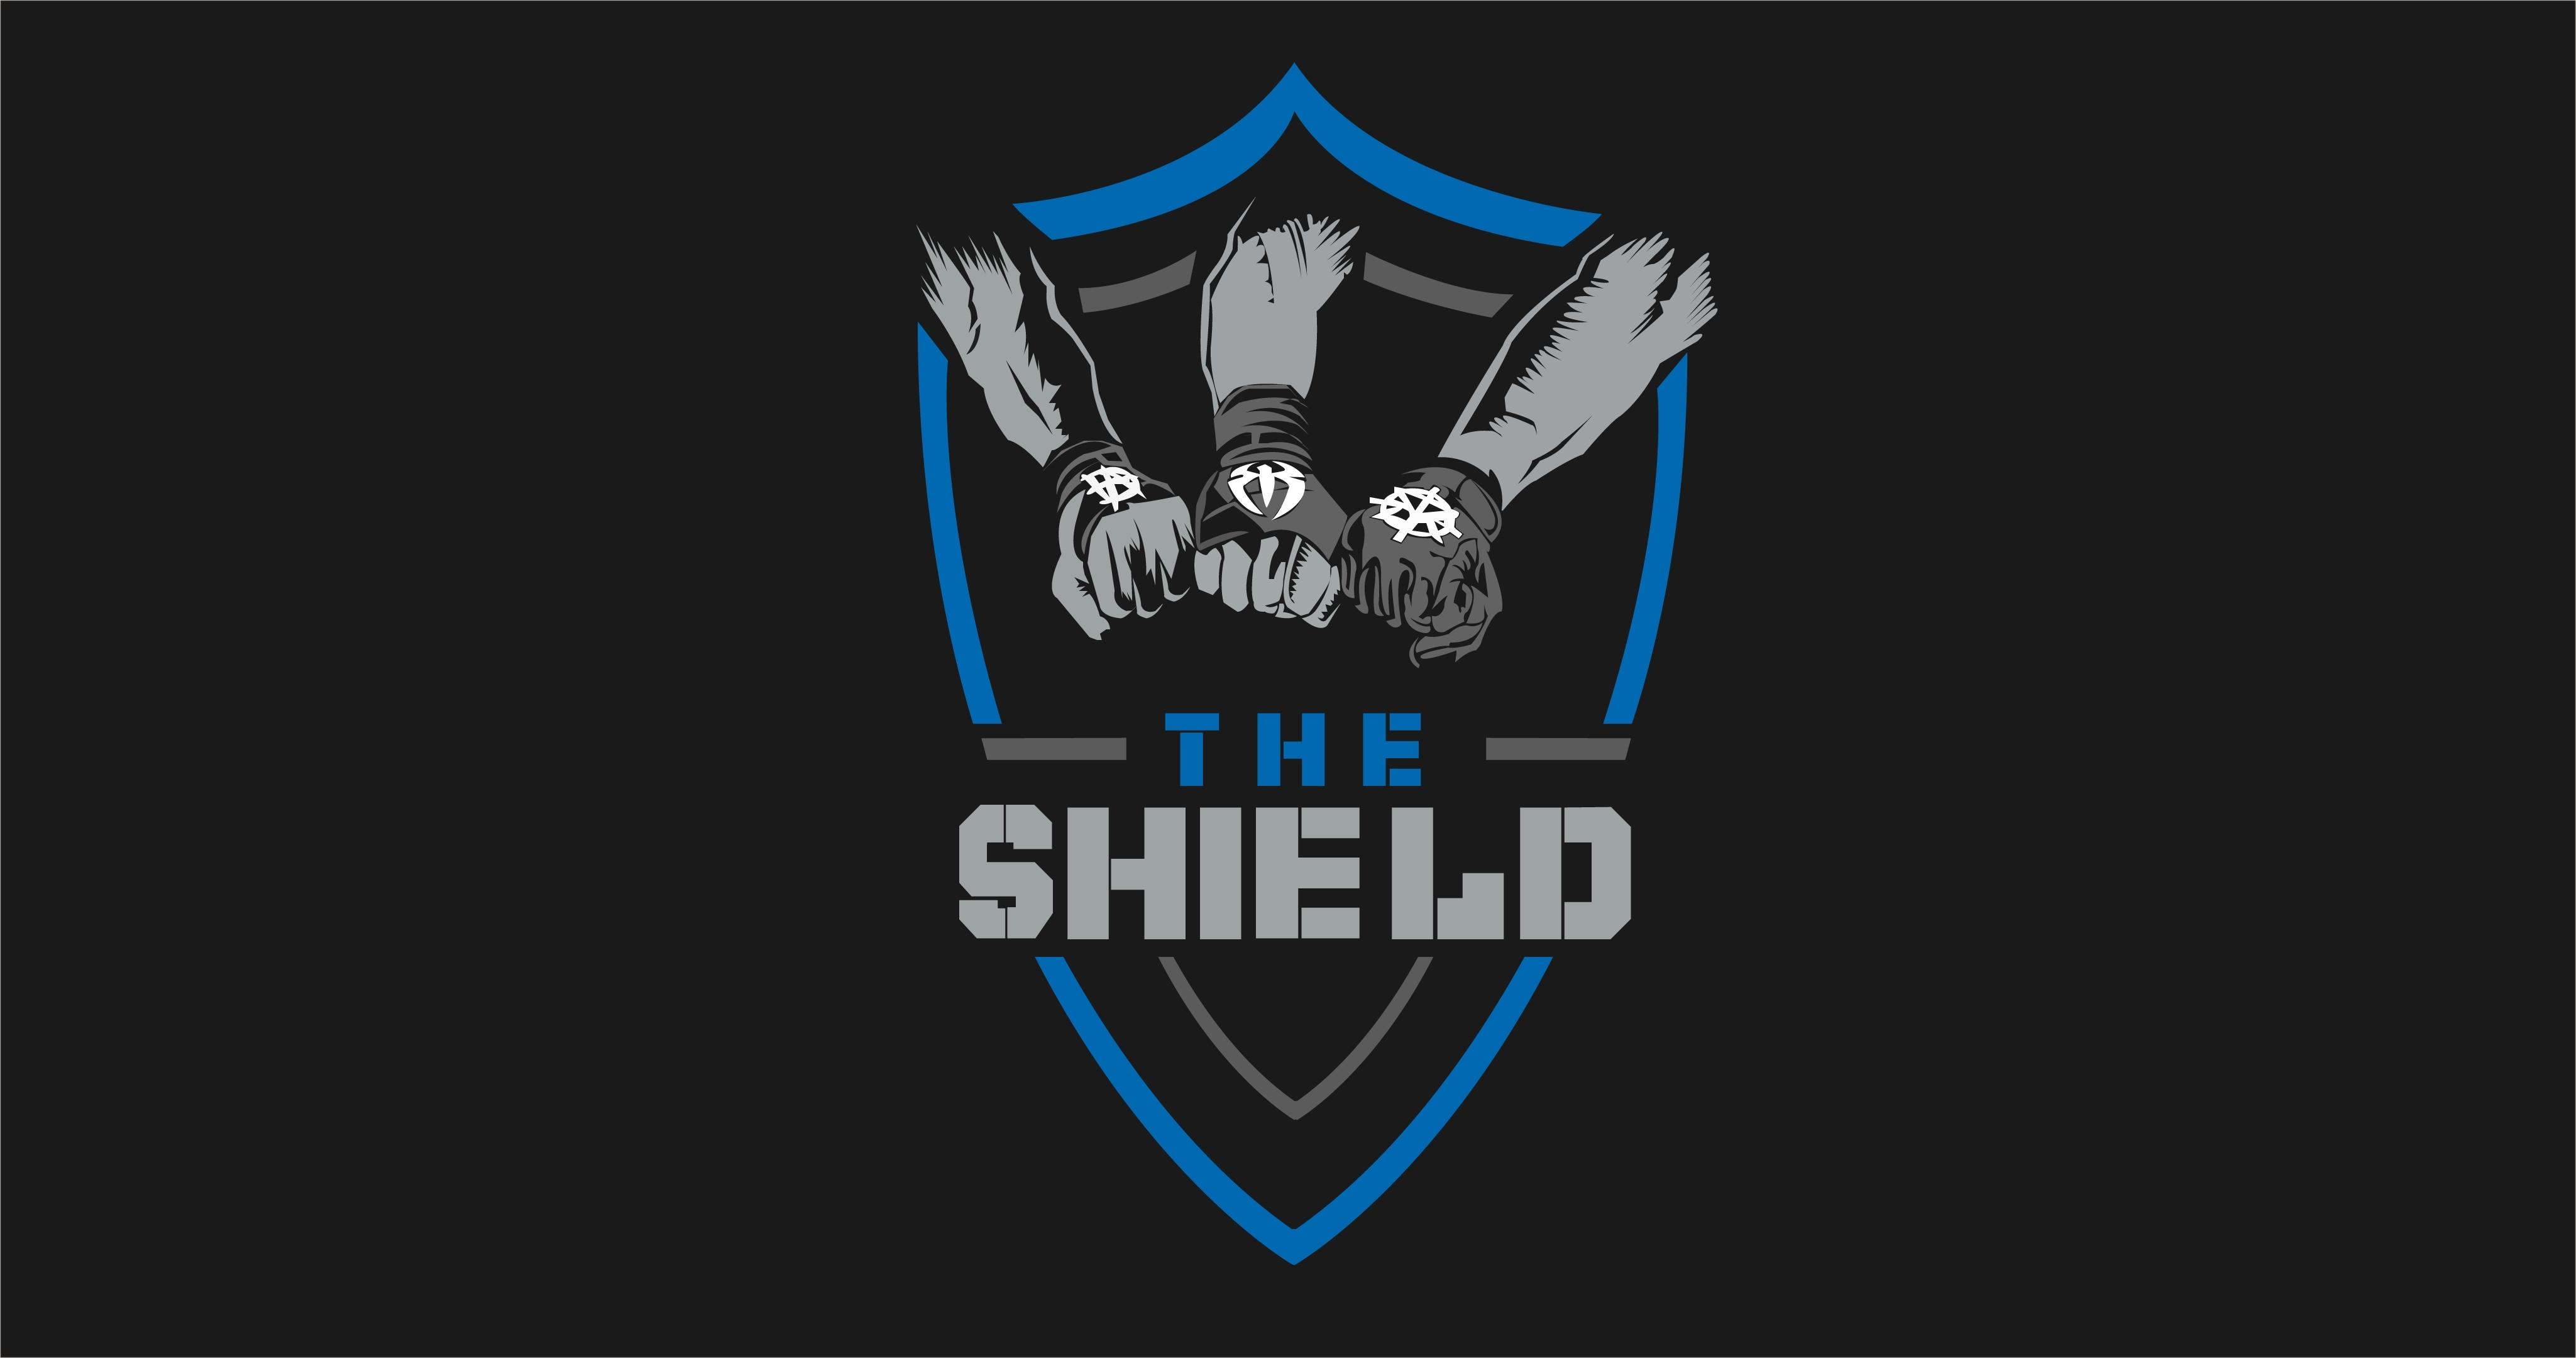 i tried recreating a 4k shield wallpaper w/ the new logo. - album on